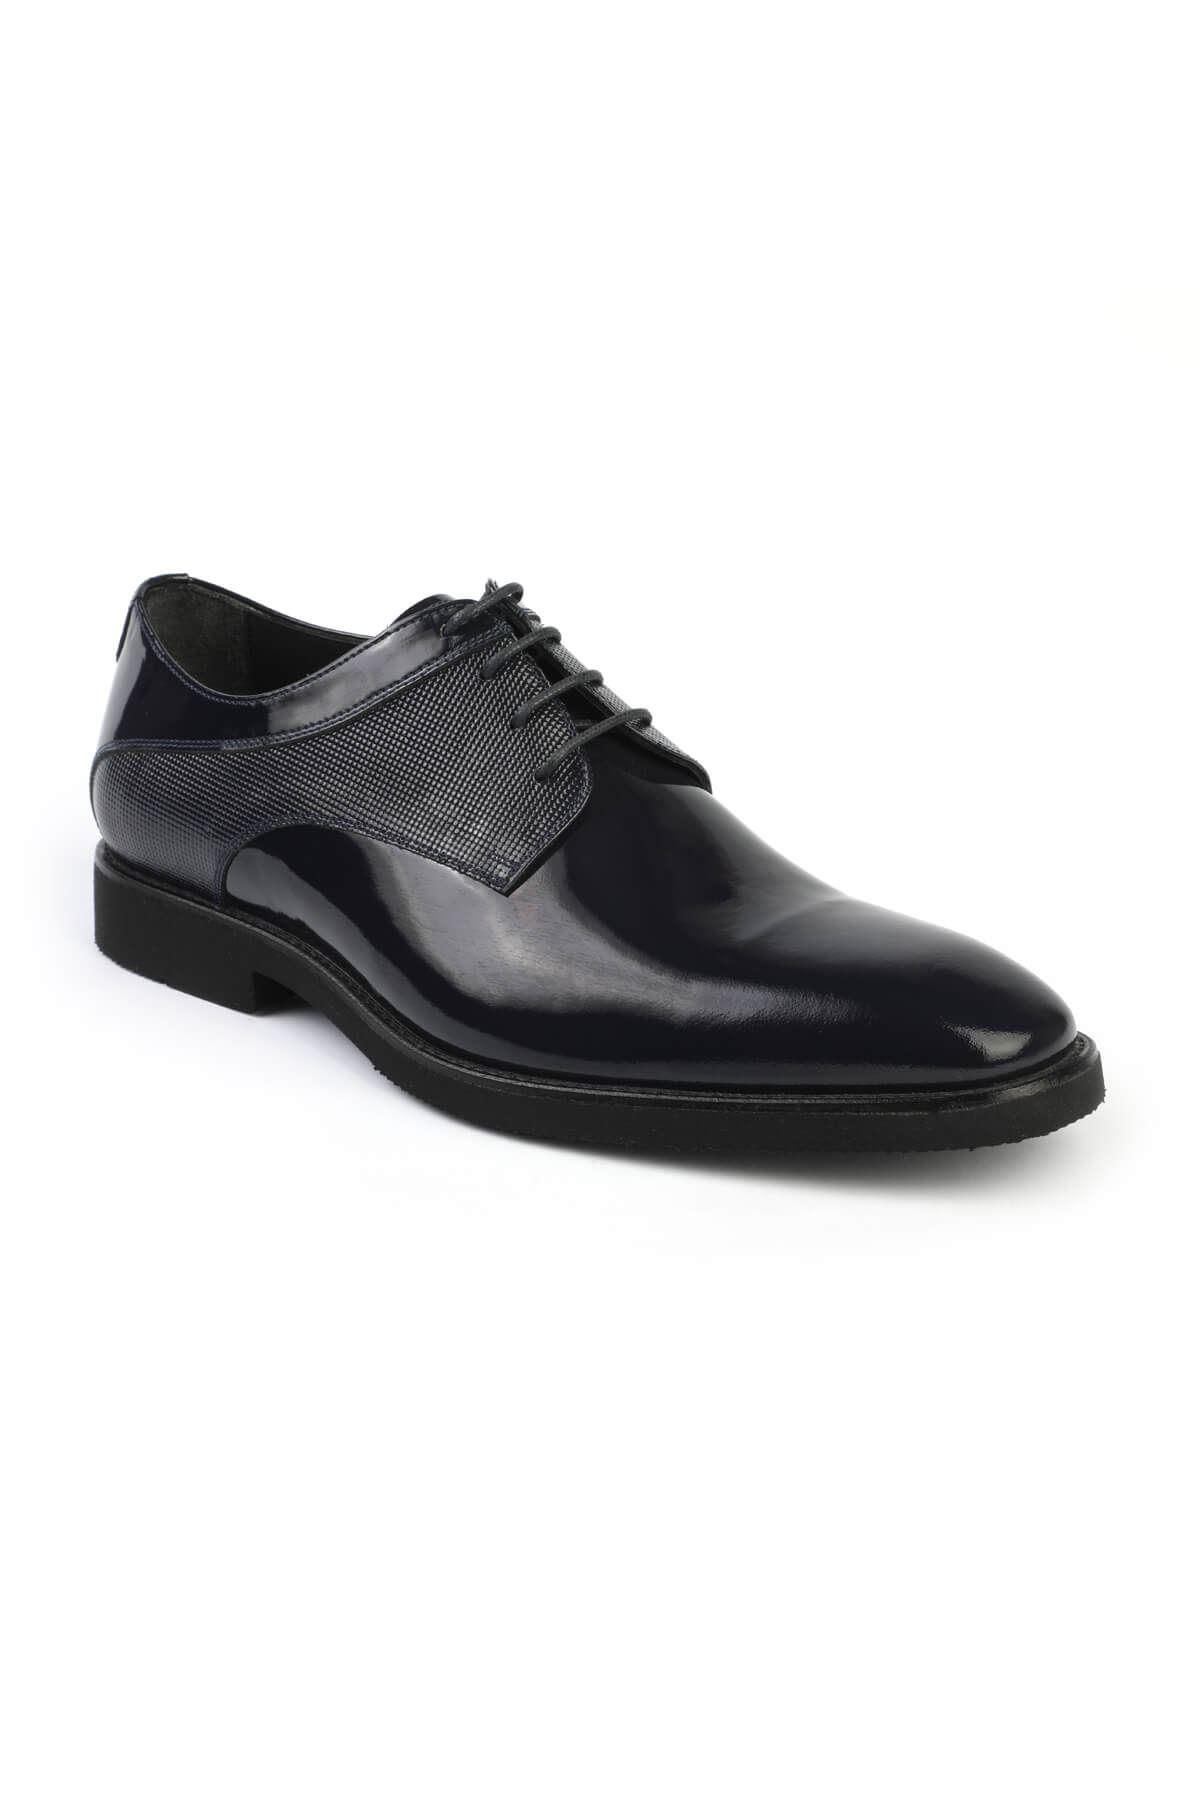 Libero C688 Navy Blue Classic Shoes